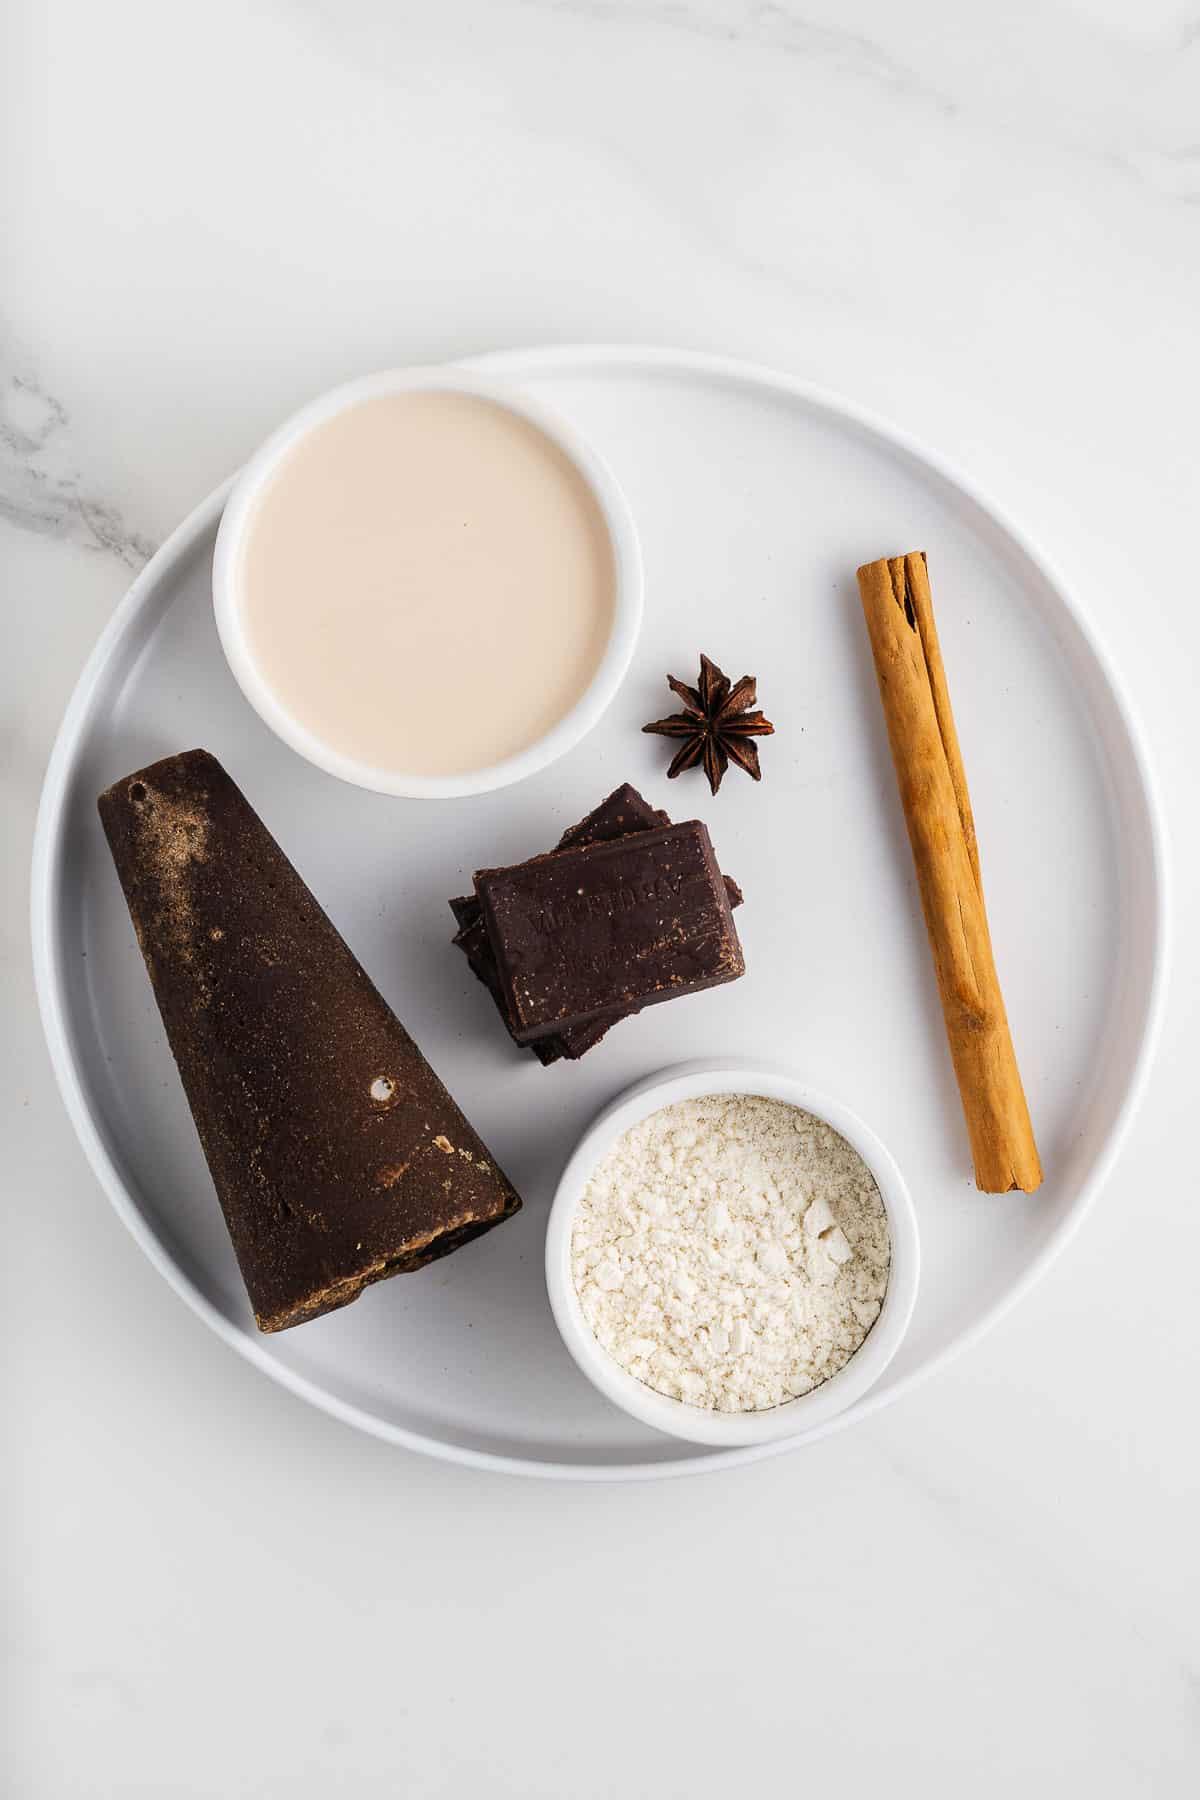 Piloncillo, Masa Harina, Cinnamon, Star Anise, Soy Milk, and Mexican Chocolate